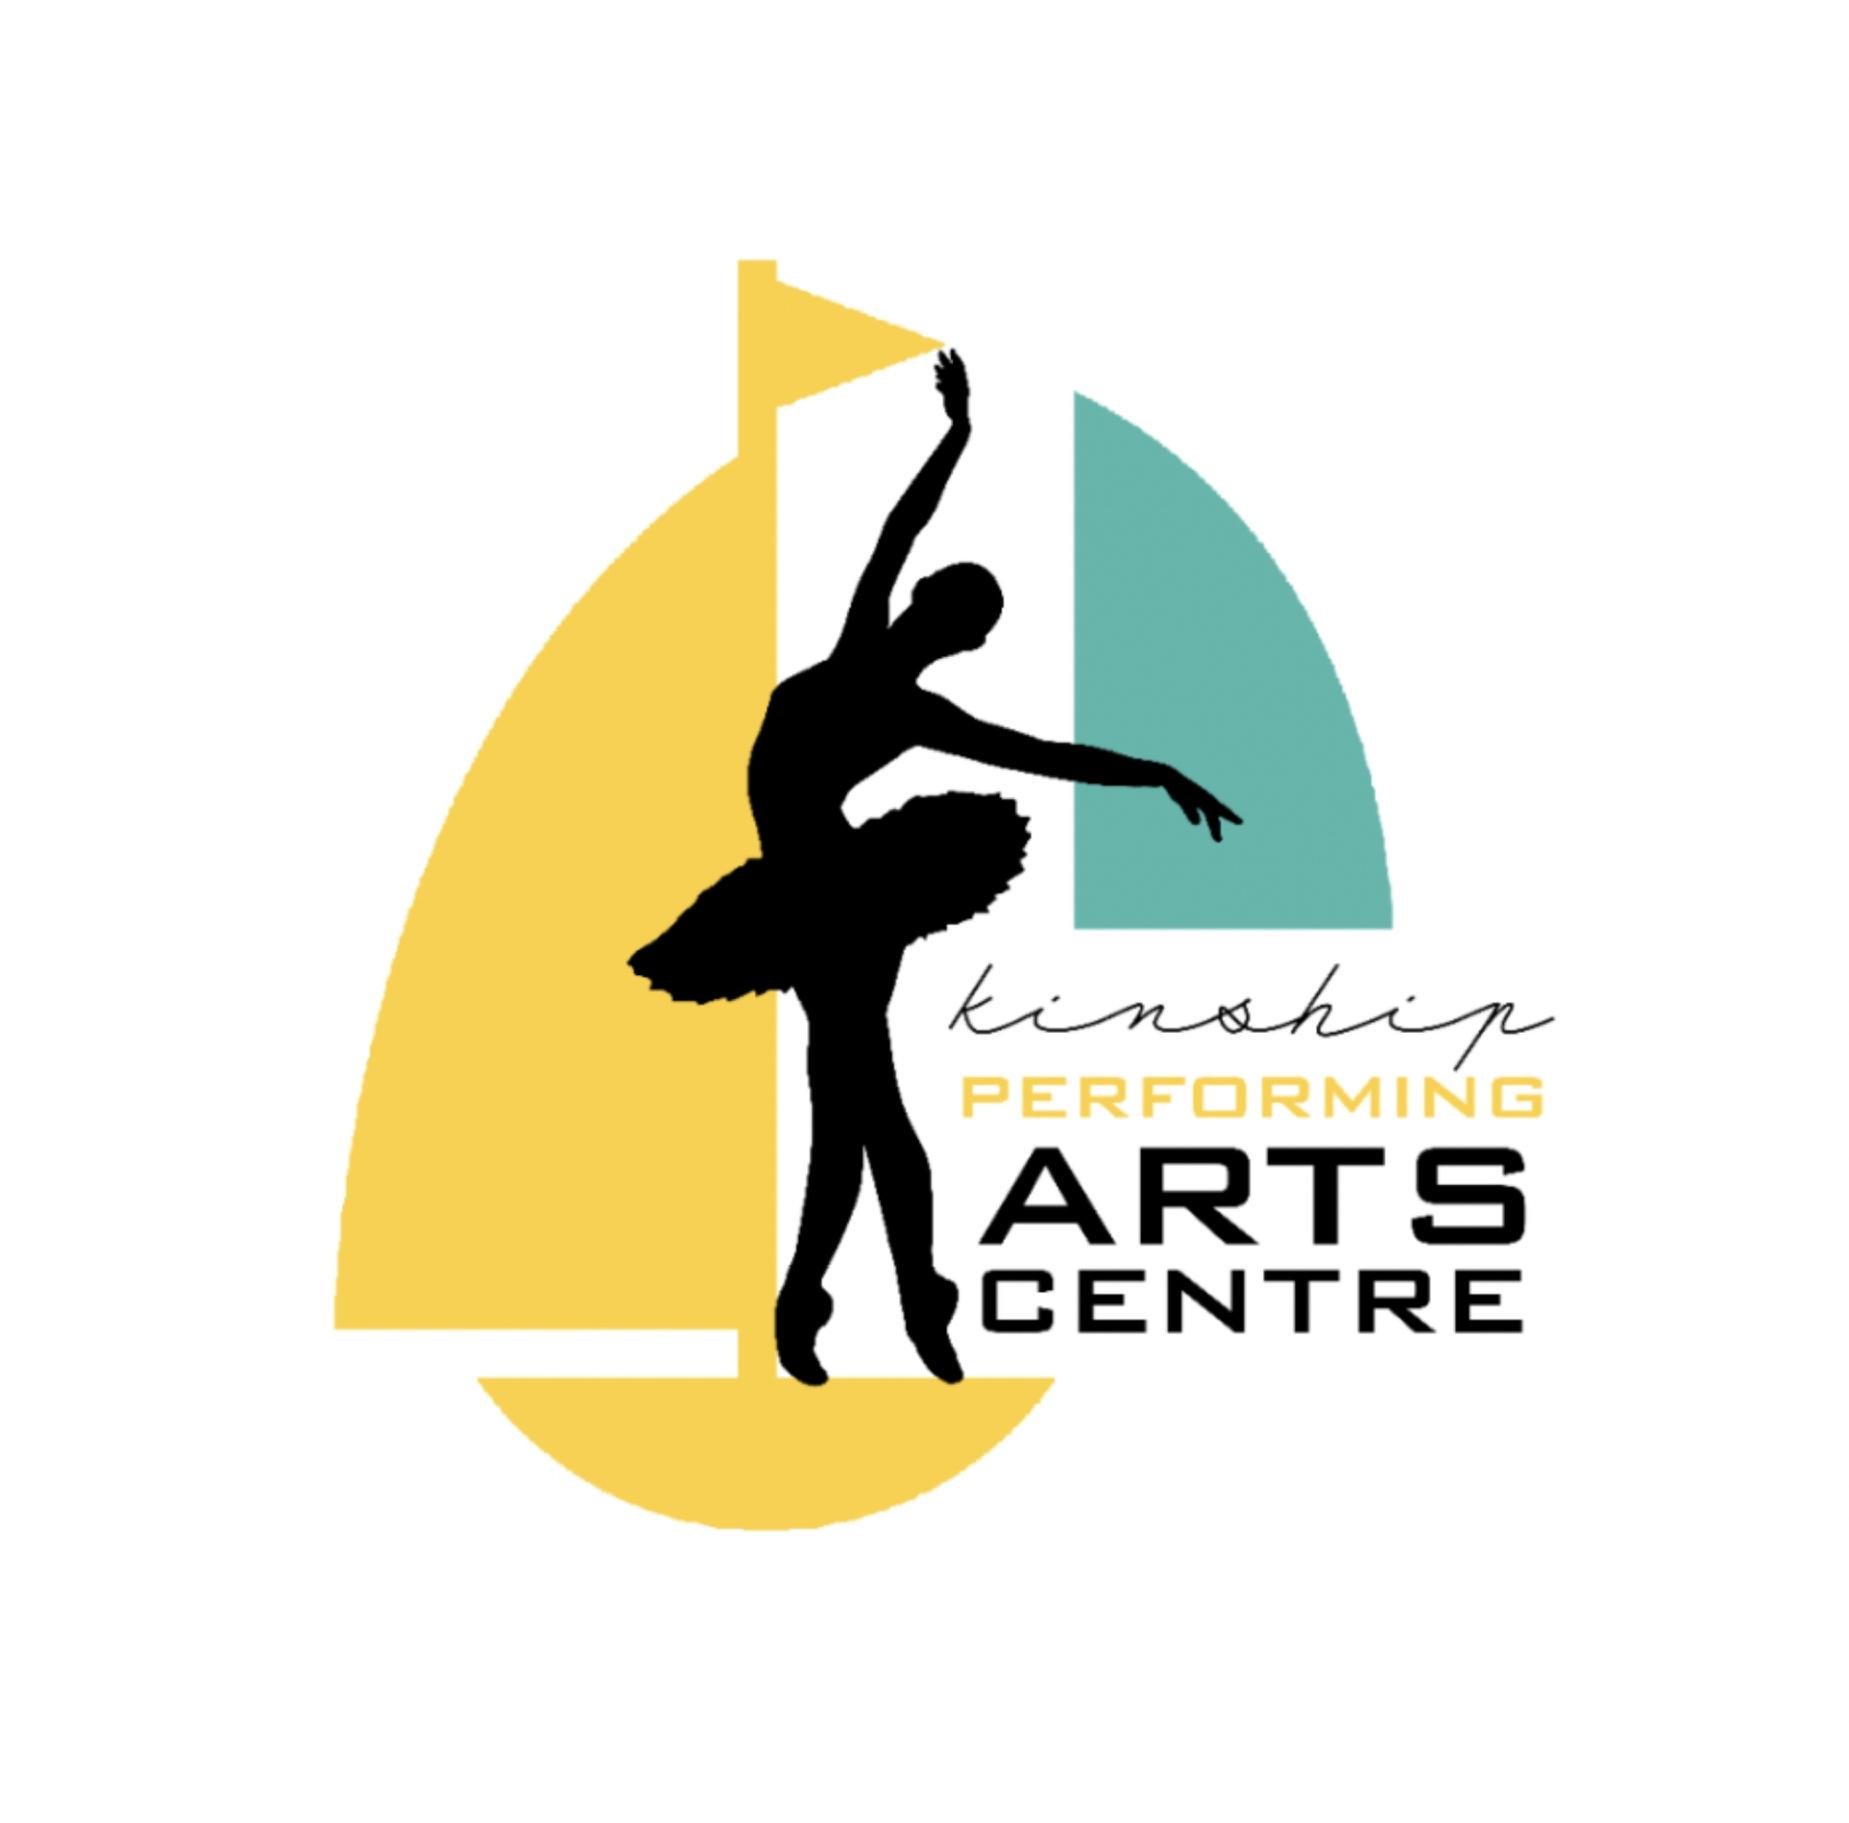 Kinship Performing Arts Centre